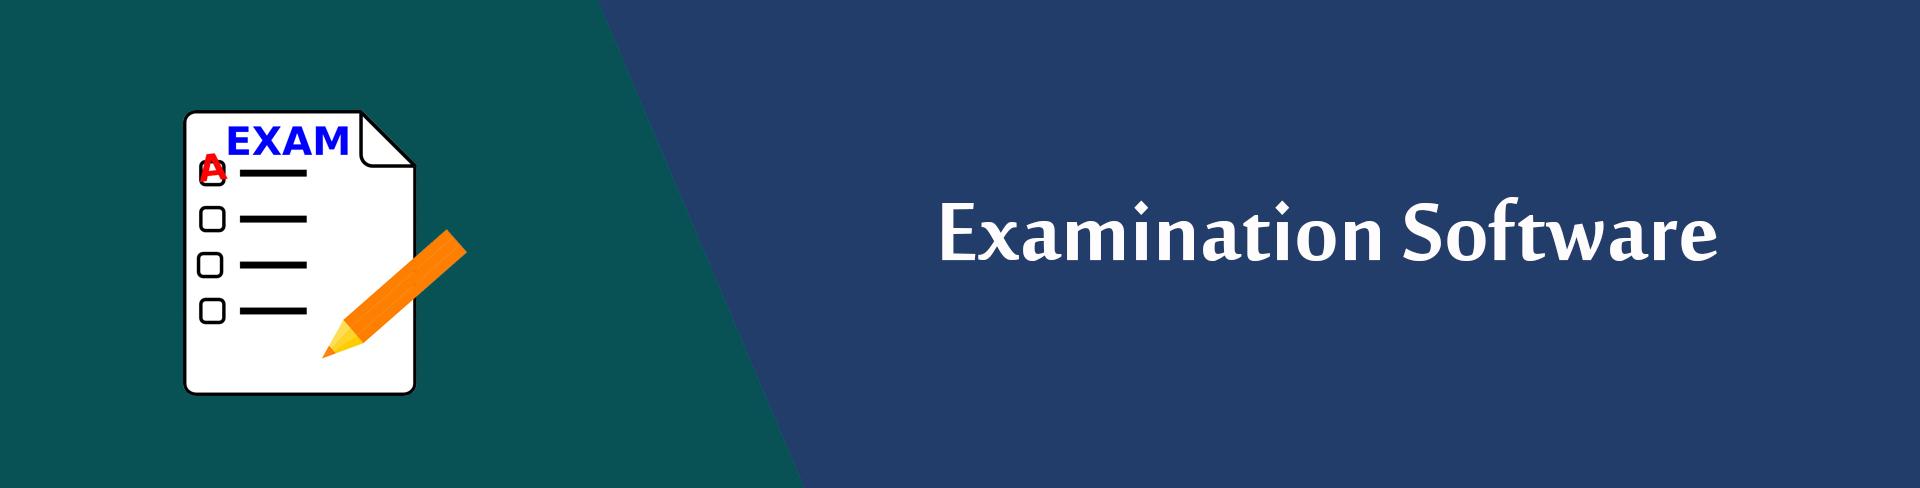 Examination Software